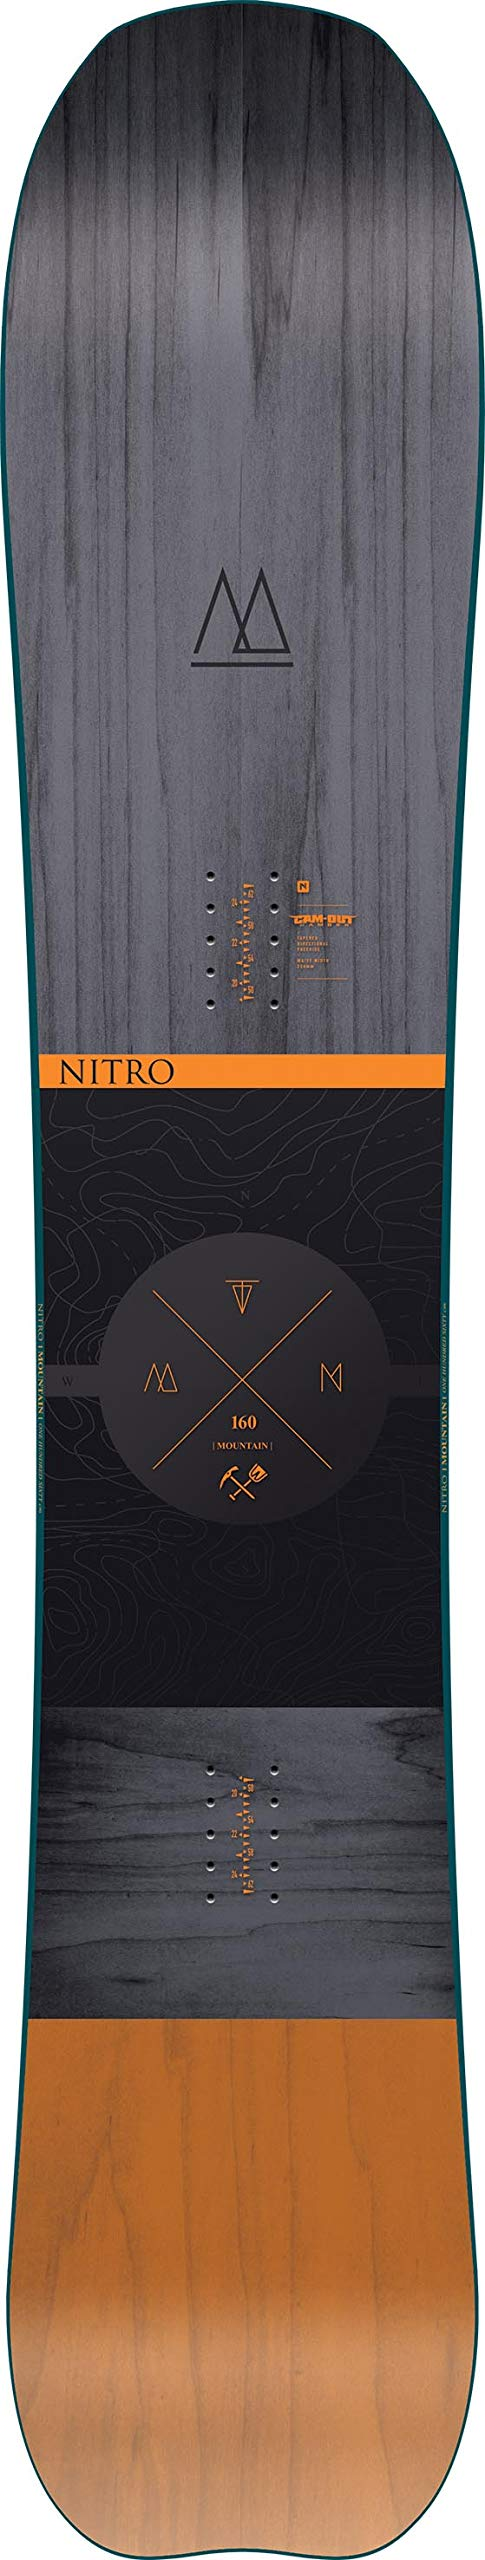 Nitro Herren 19 All-Mountain Freeride Board in Mid-Wide, Mehrfarbig, 163